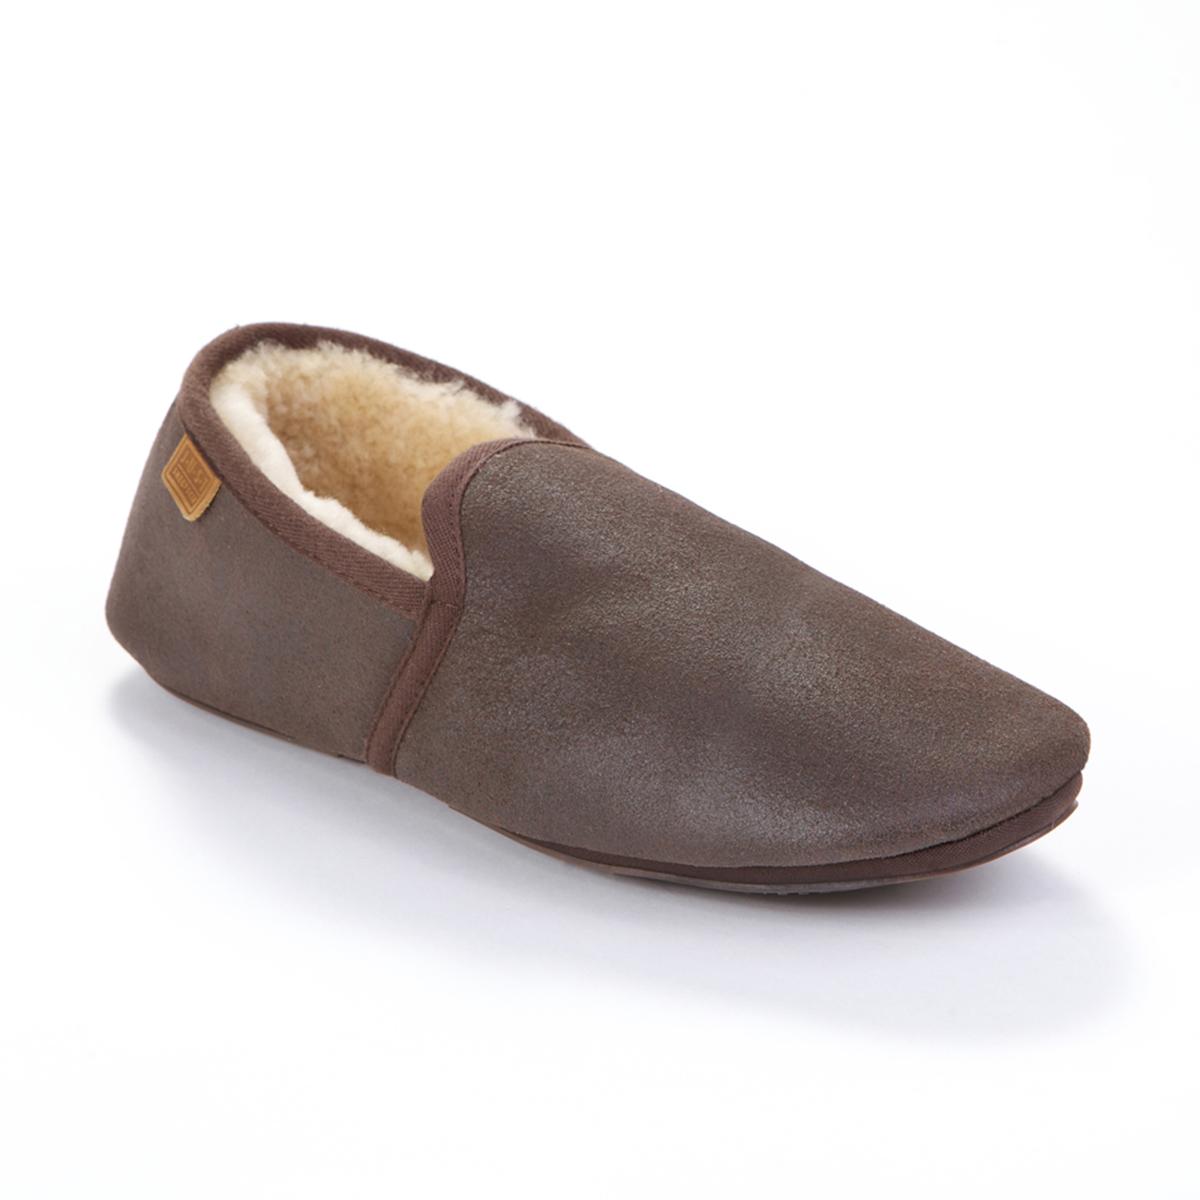 mens garrick sheepskin slippers just sheepskin slippers